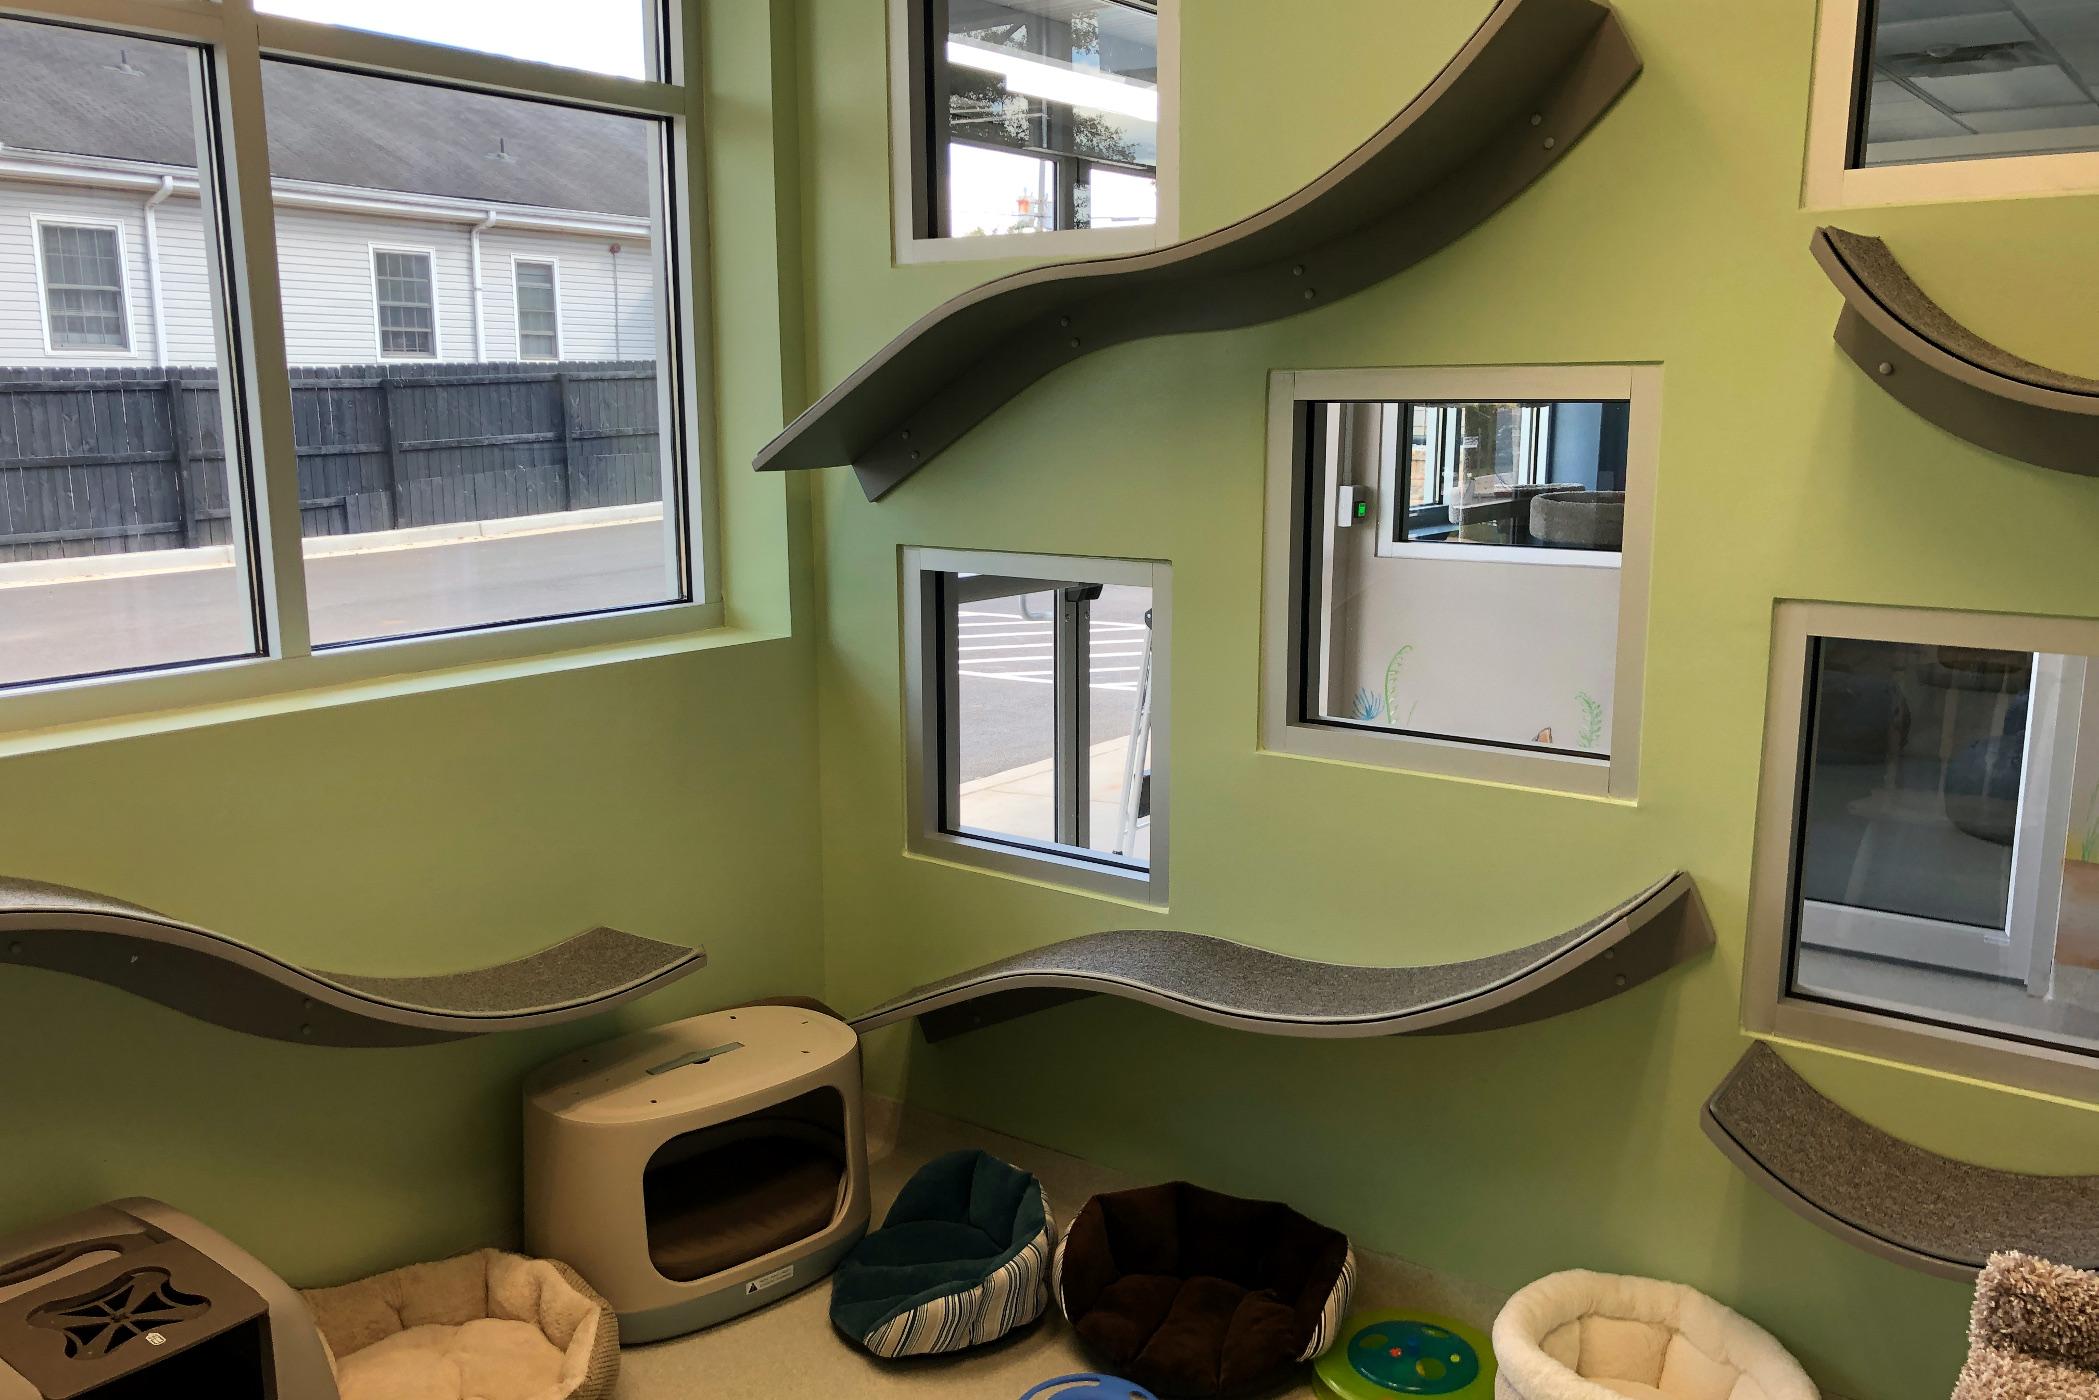 2. Kitten Room